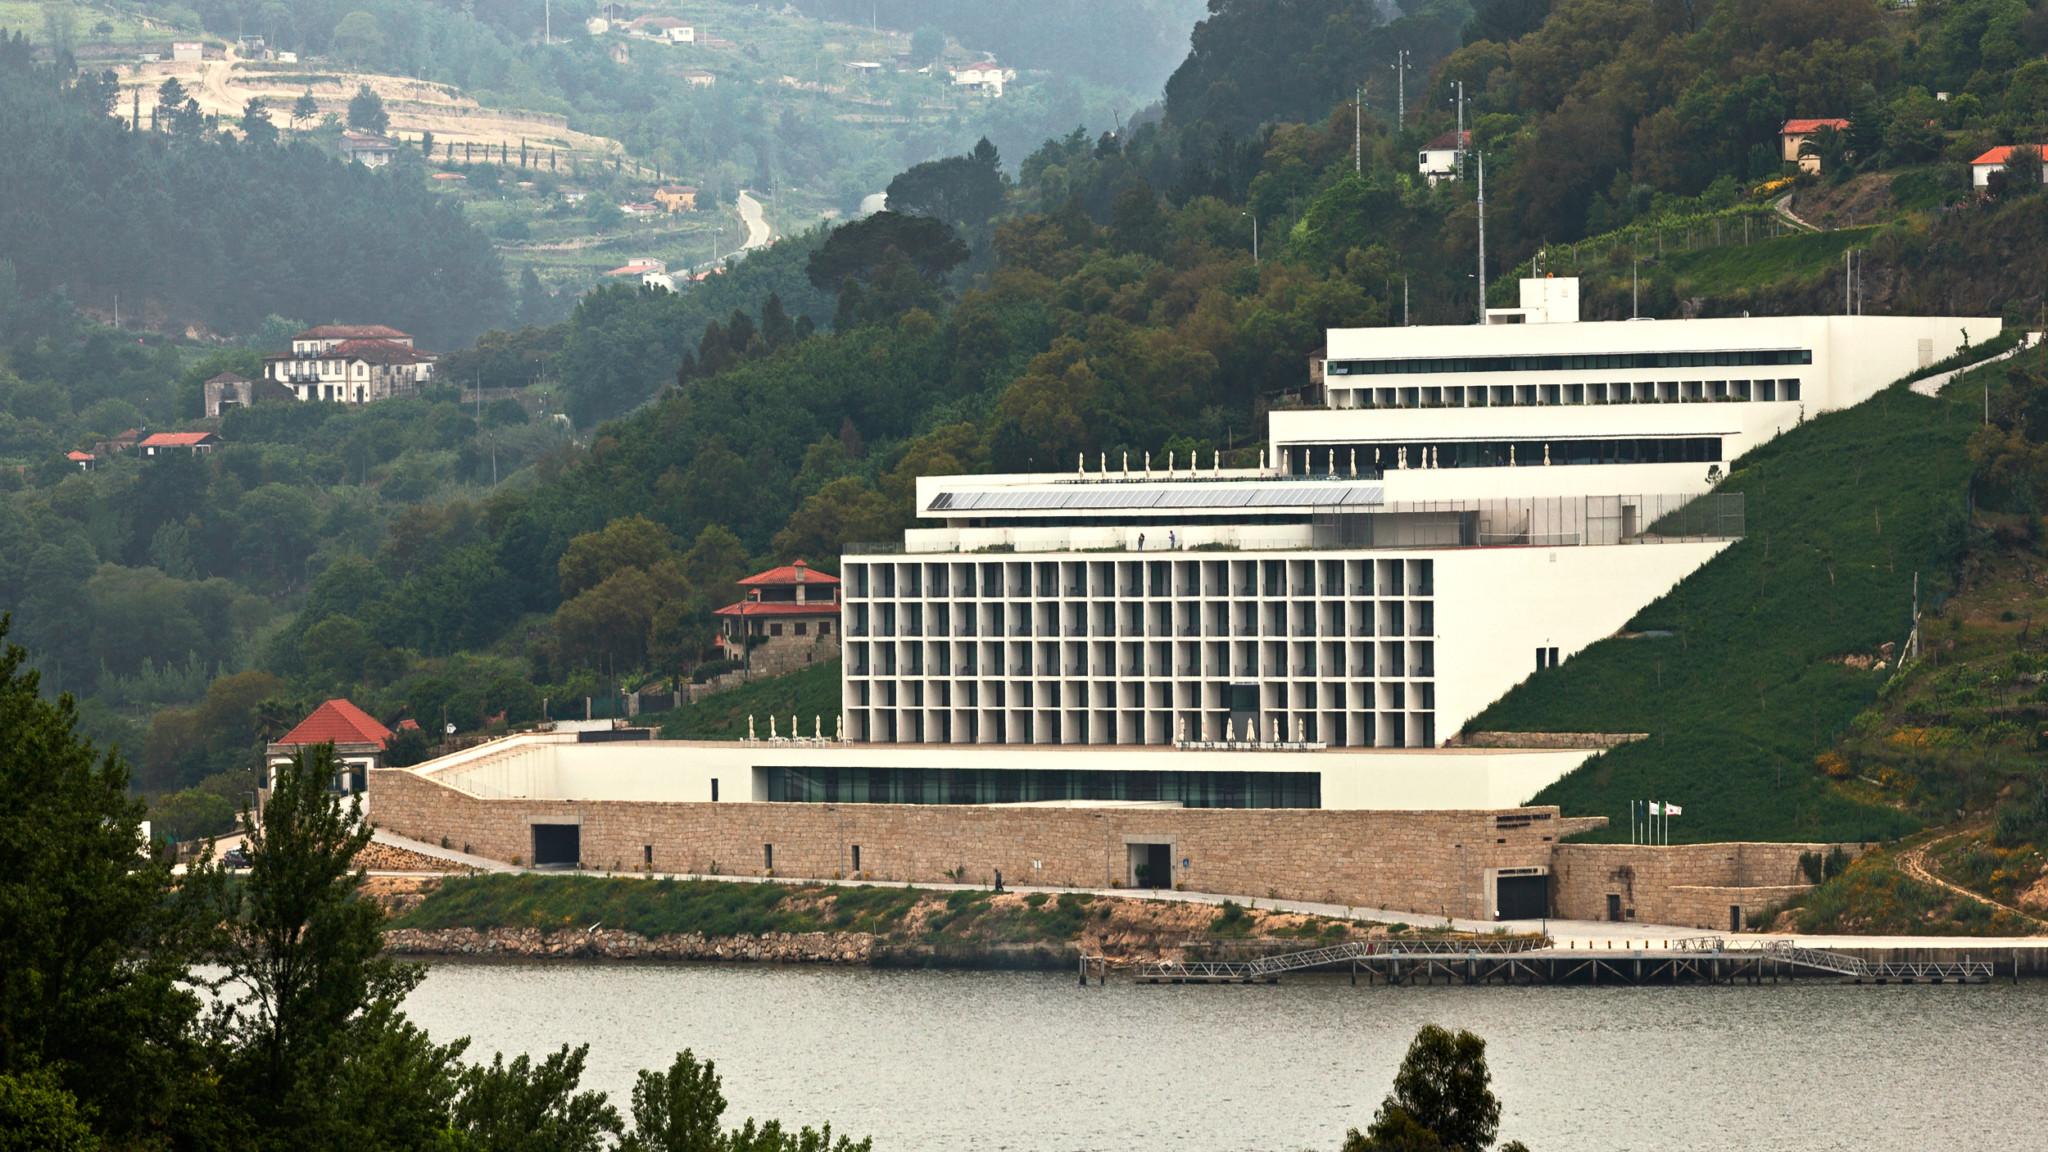 Douro Royal Valley Hotel Acolhe Formacao Em Revenue Management